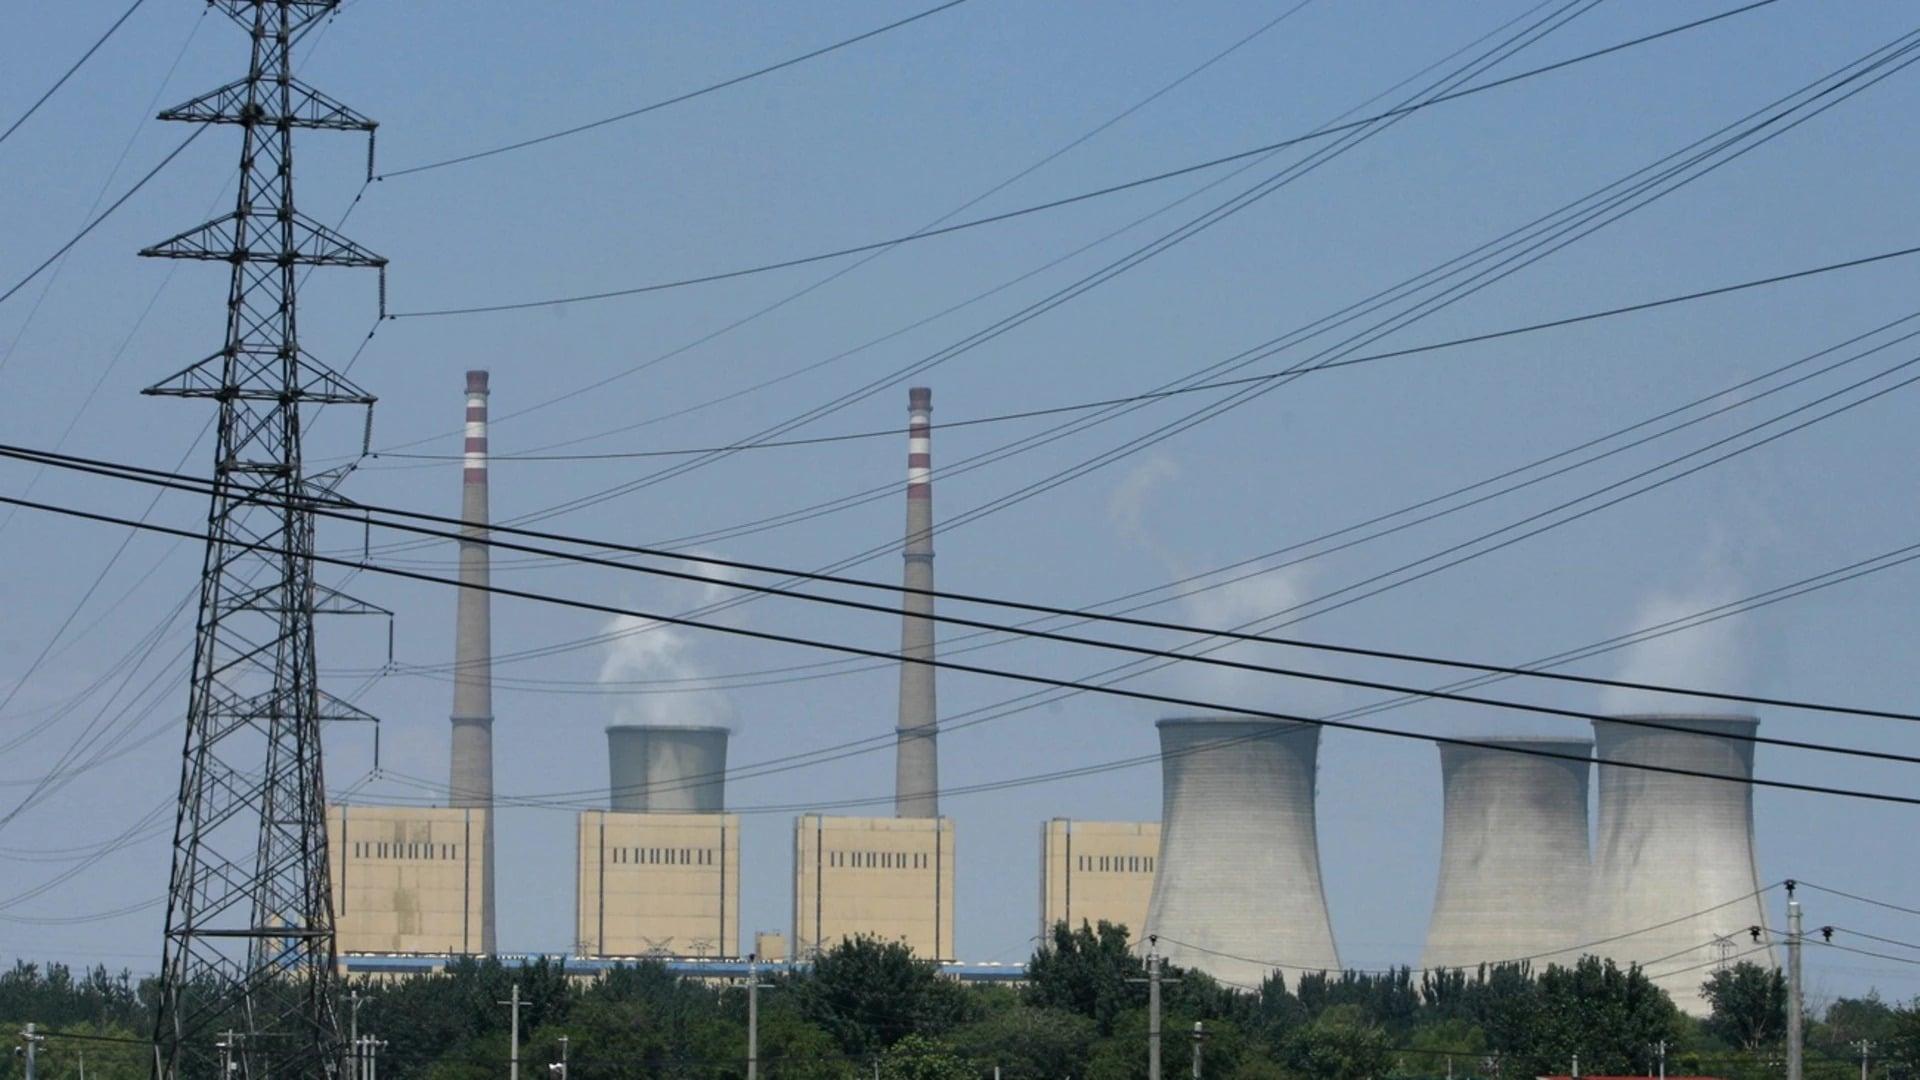 Nucleare, Taishan, fissione, cina, francia, stati uniti, pwr, epr, radiazioni, Energy Close-Up Engineering